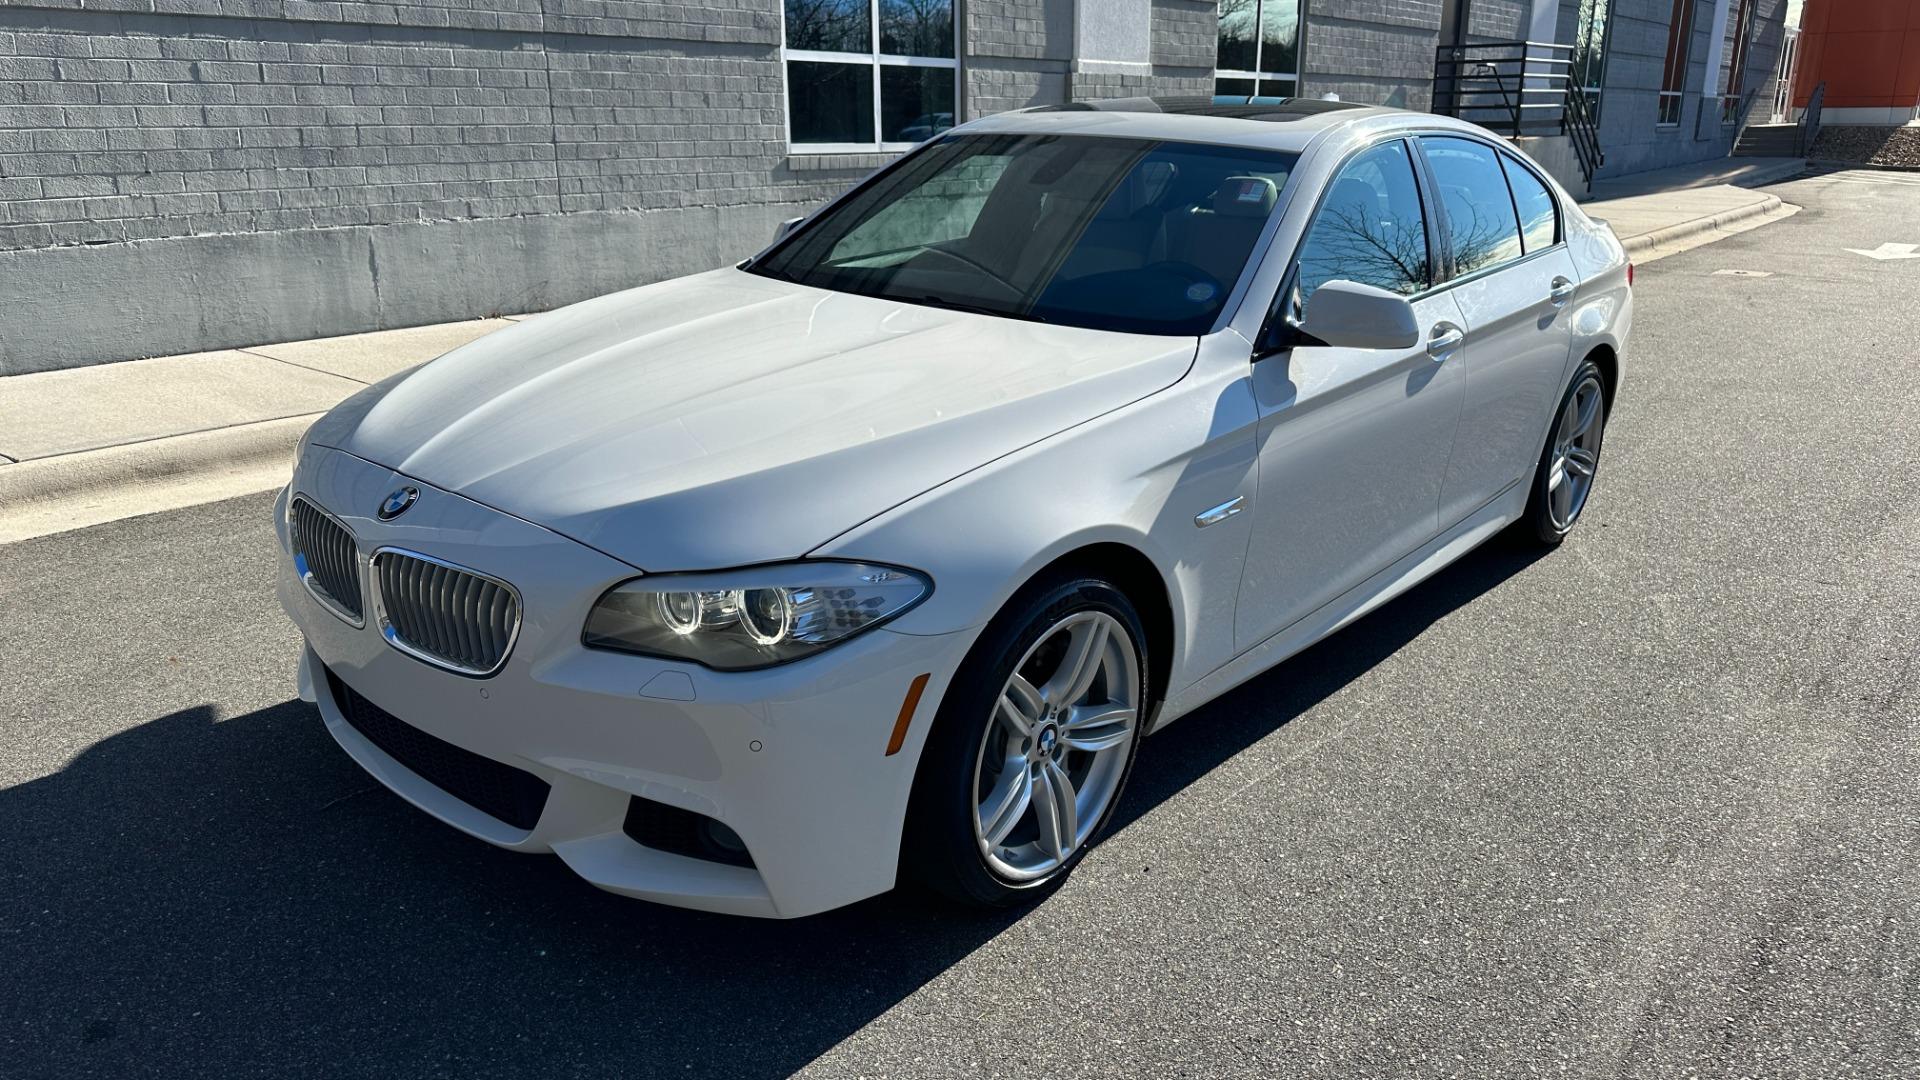 Used 2012 BMW 5 SERIES 550I M SPORT / NAV / CONV PKG / SUNROOF / PREM SND / REARVIEW for sale Sold at Formula Imports in Charlotte NC 28227 2